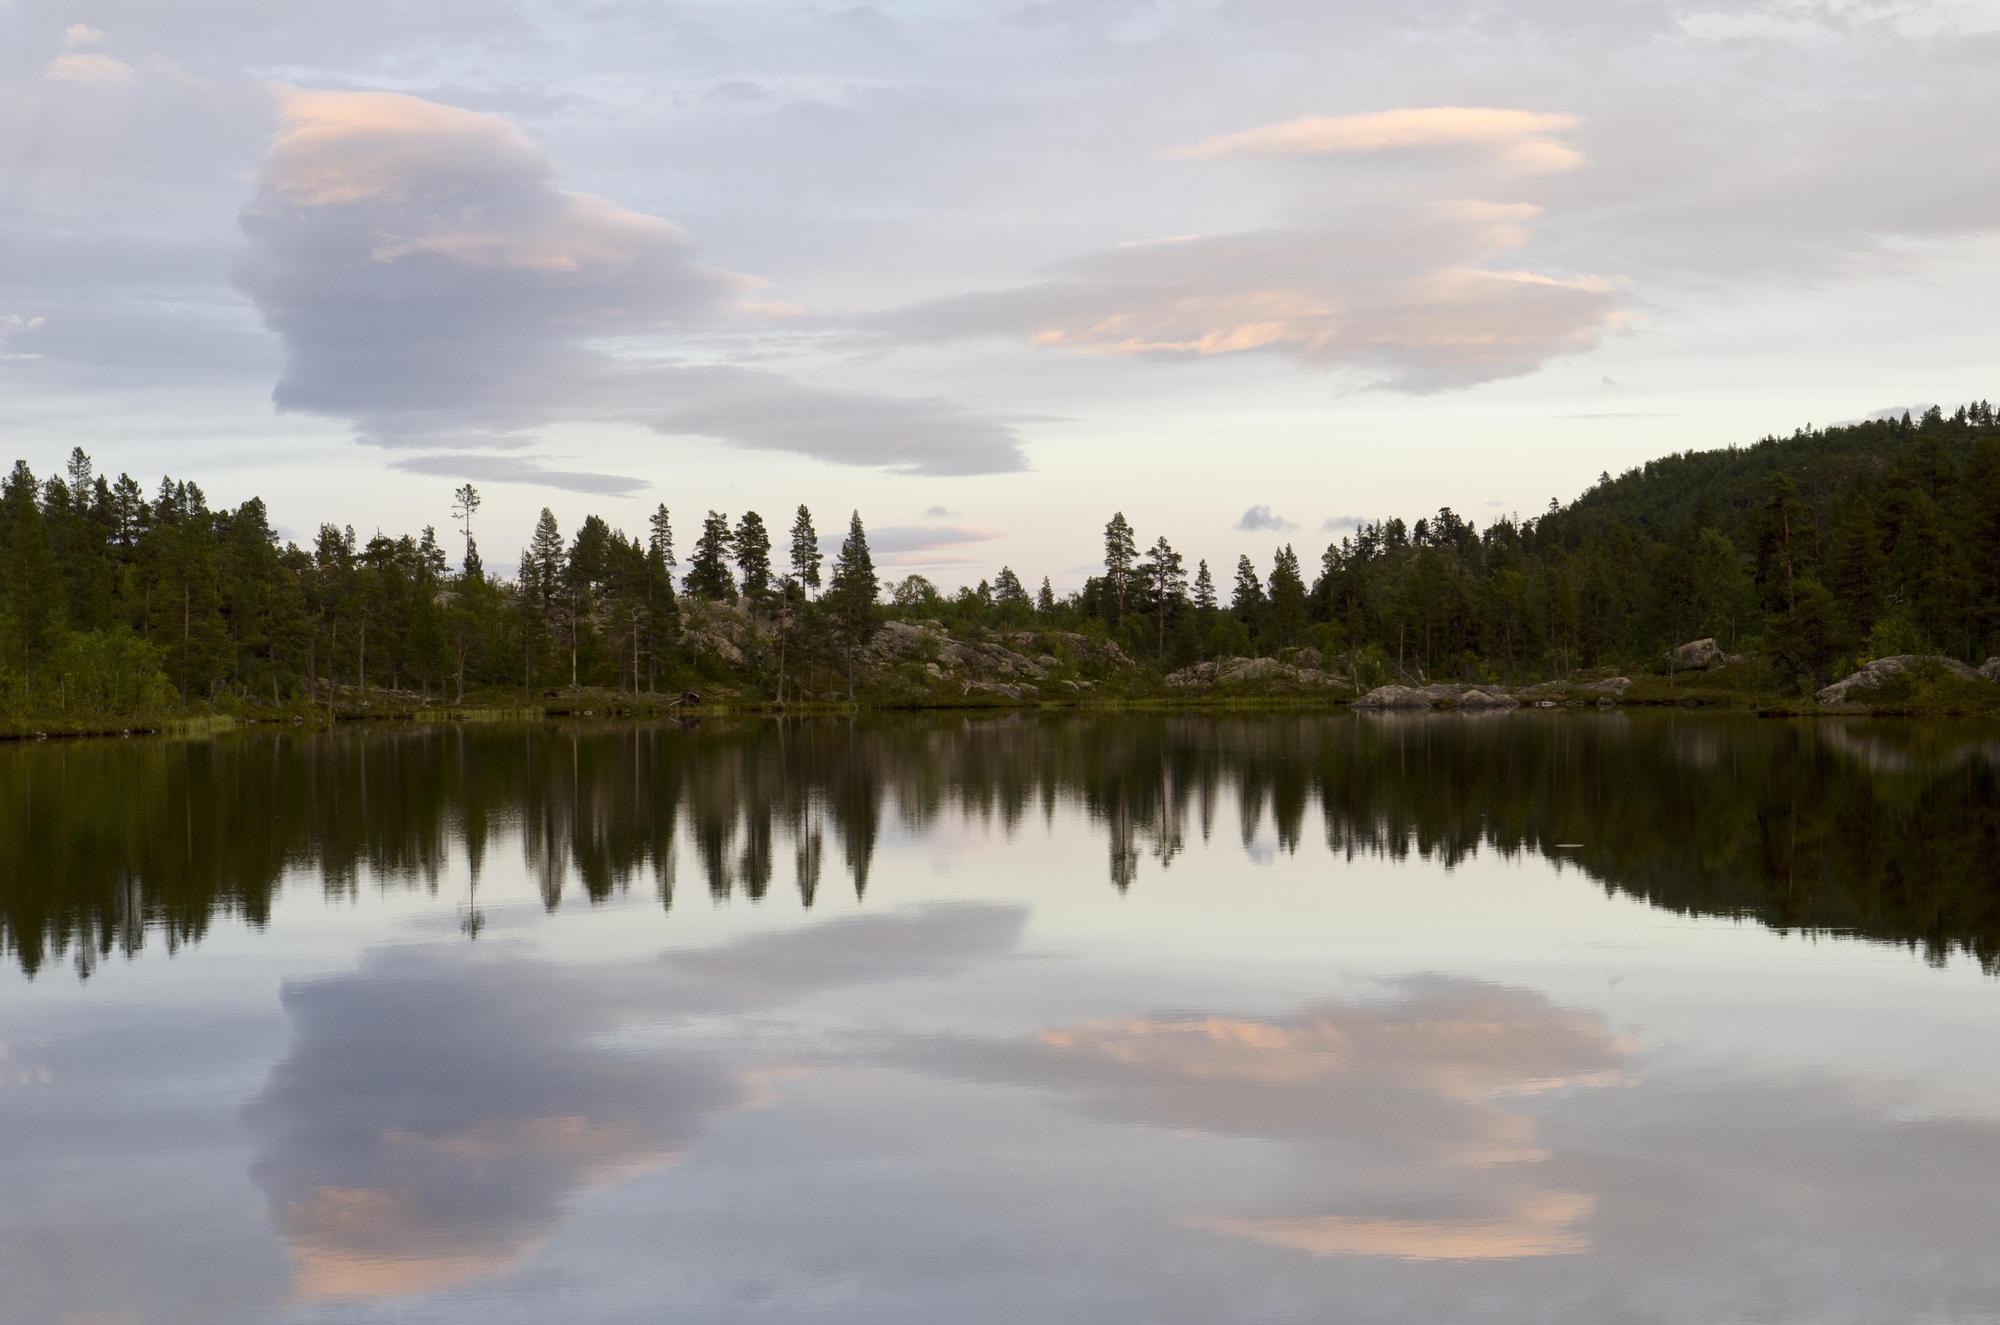 REFLECTION di rominafiaschiphotography